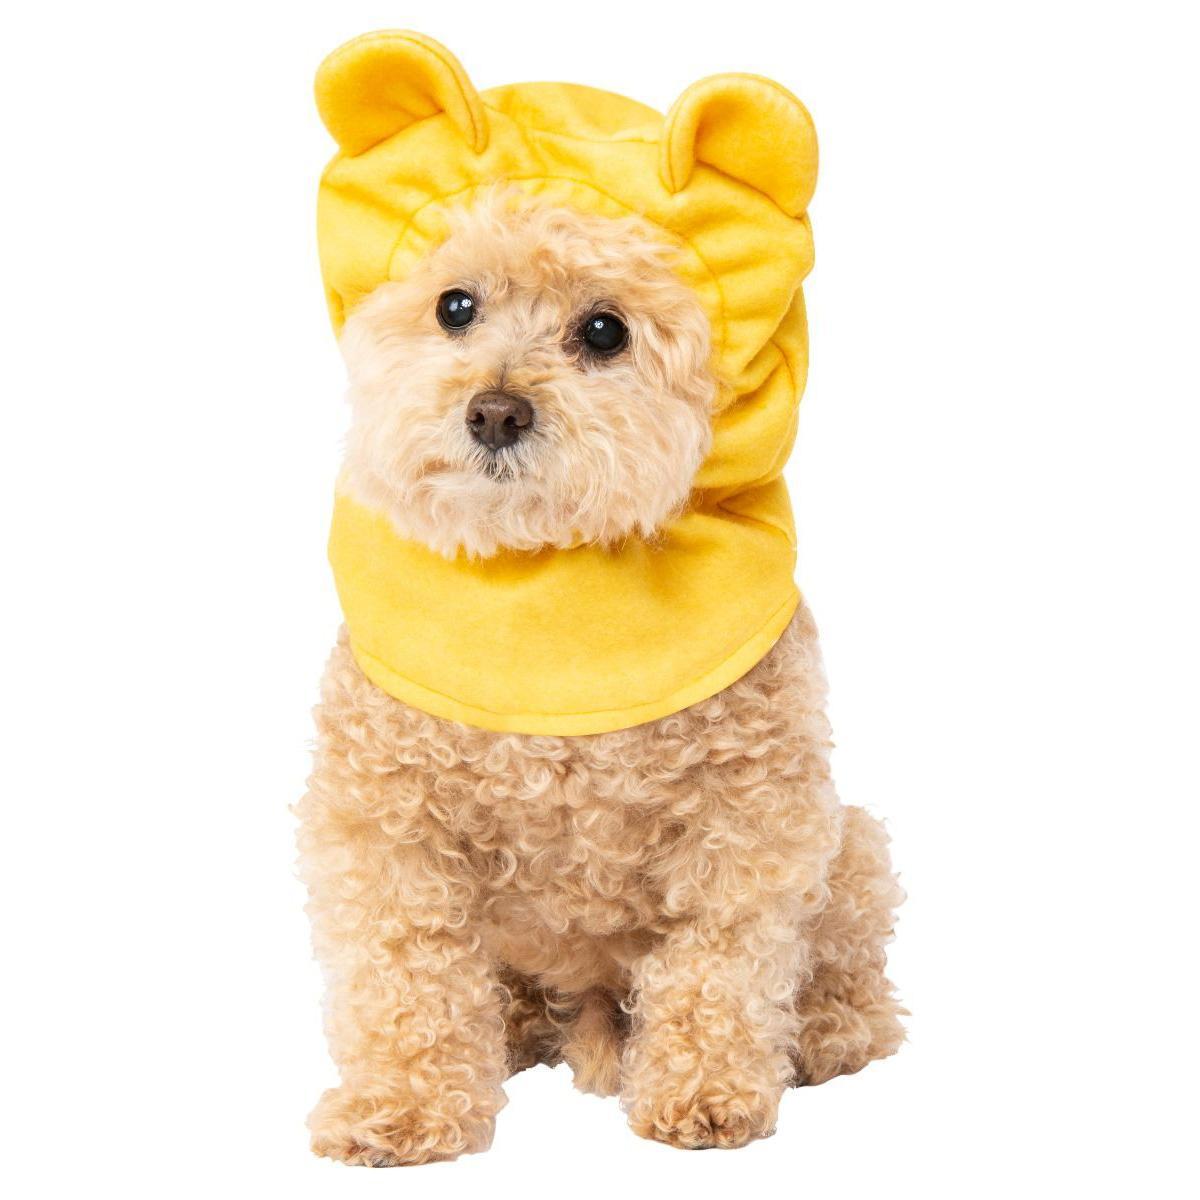 Winnie The Pooh Headpiece Dog Costume by Rubies